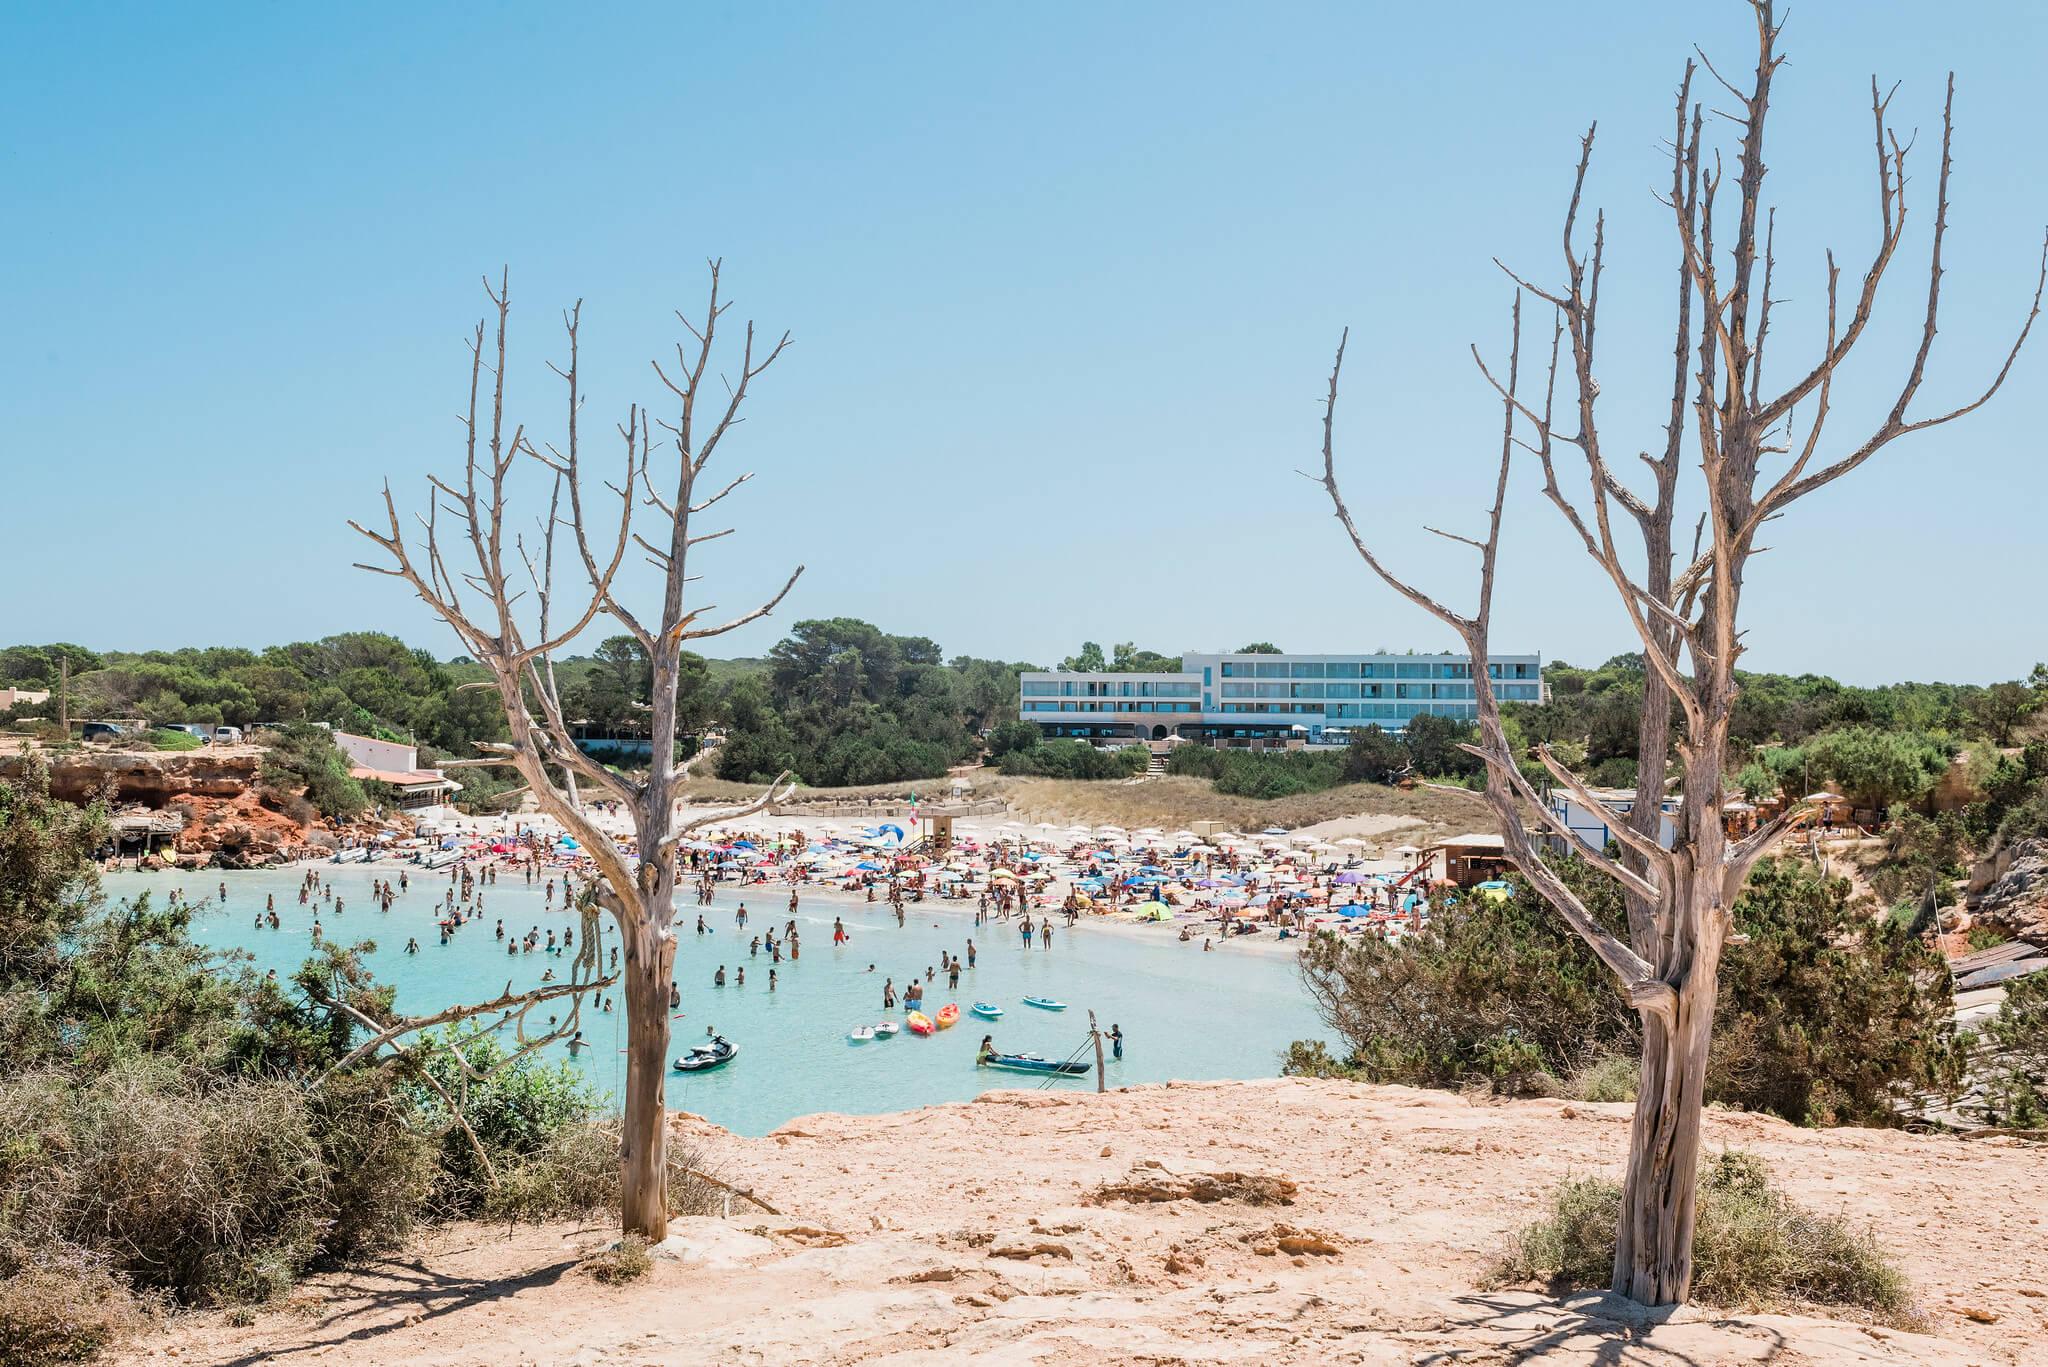 https://www.white-ibiza.com/wp-content/uploads/2020/03/formentera-beaches-cala-saona-2020-03.jpg